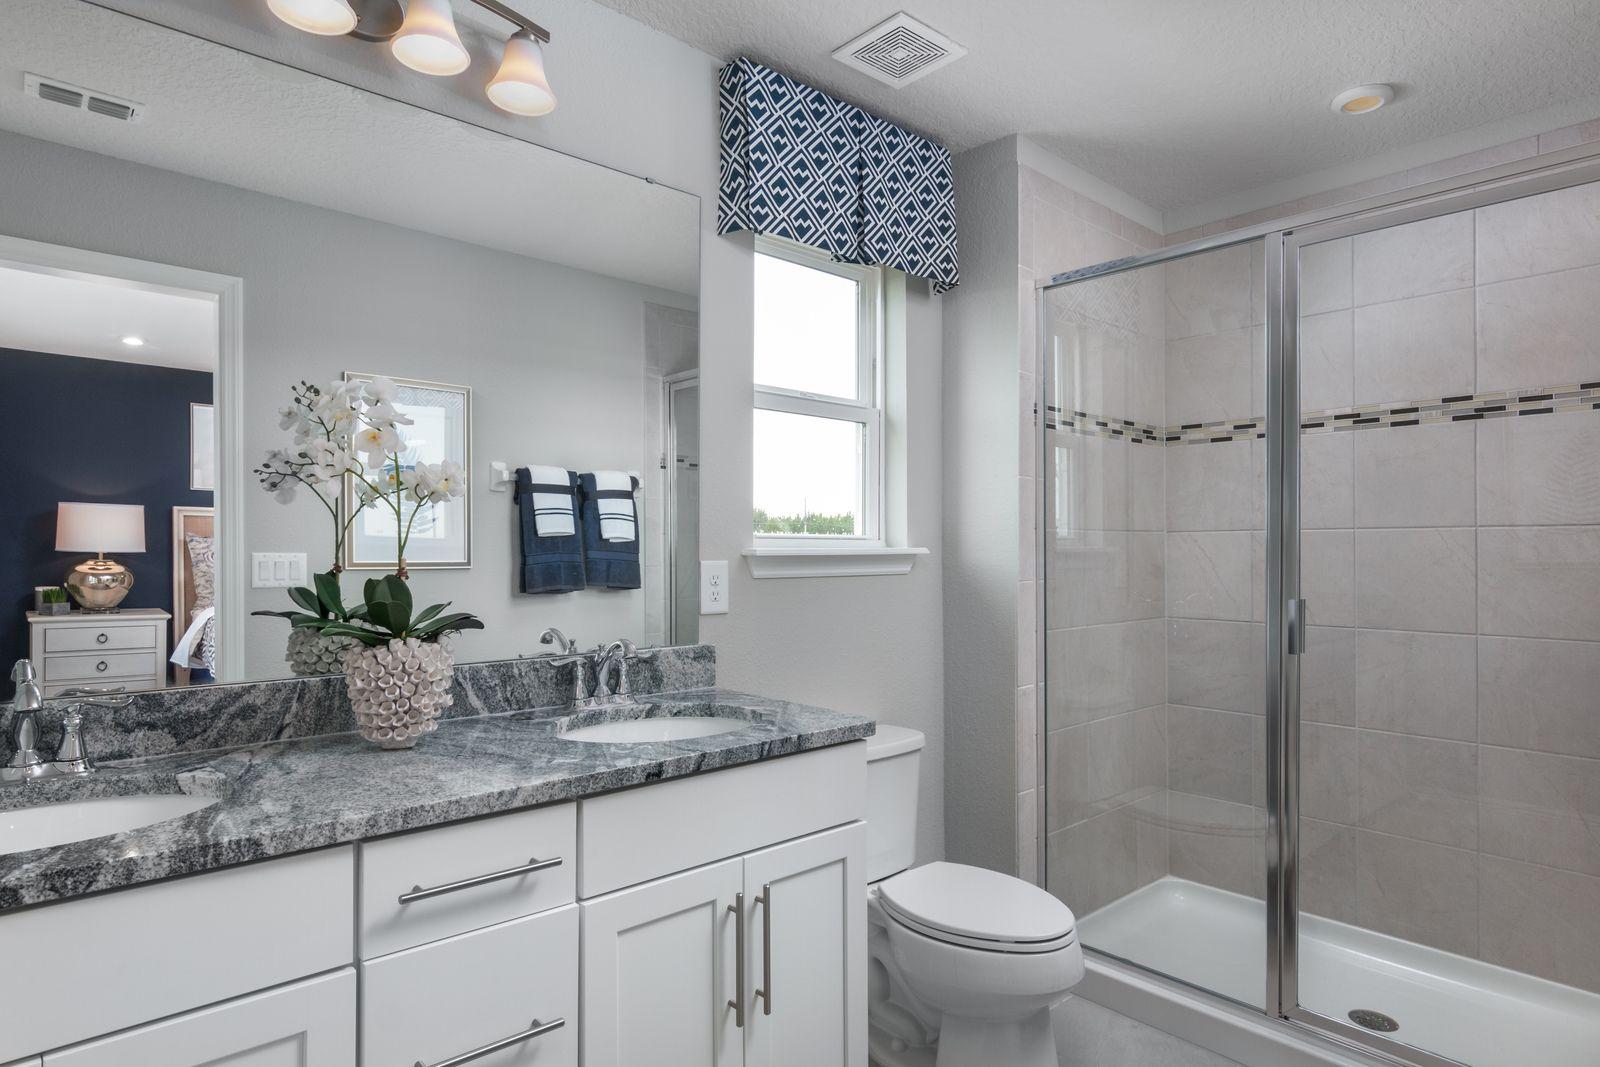 Bathroom featured in the Haydn By Ryan Homes in Orlando, FL